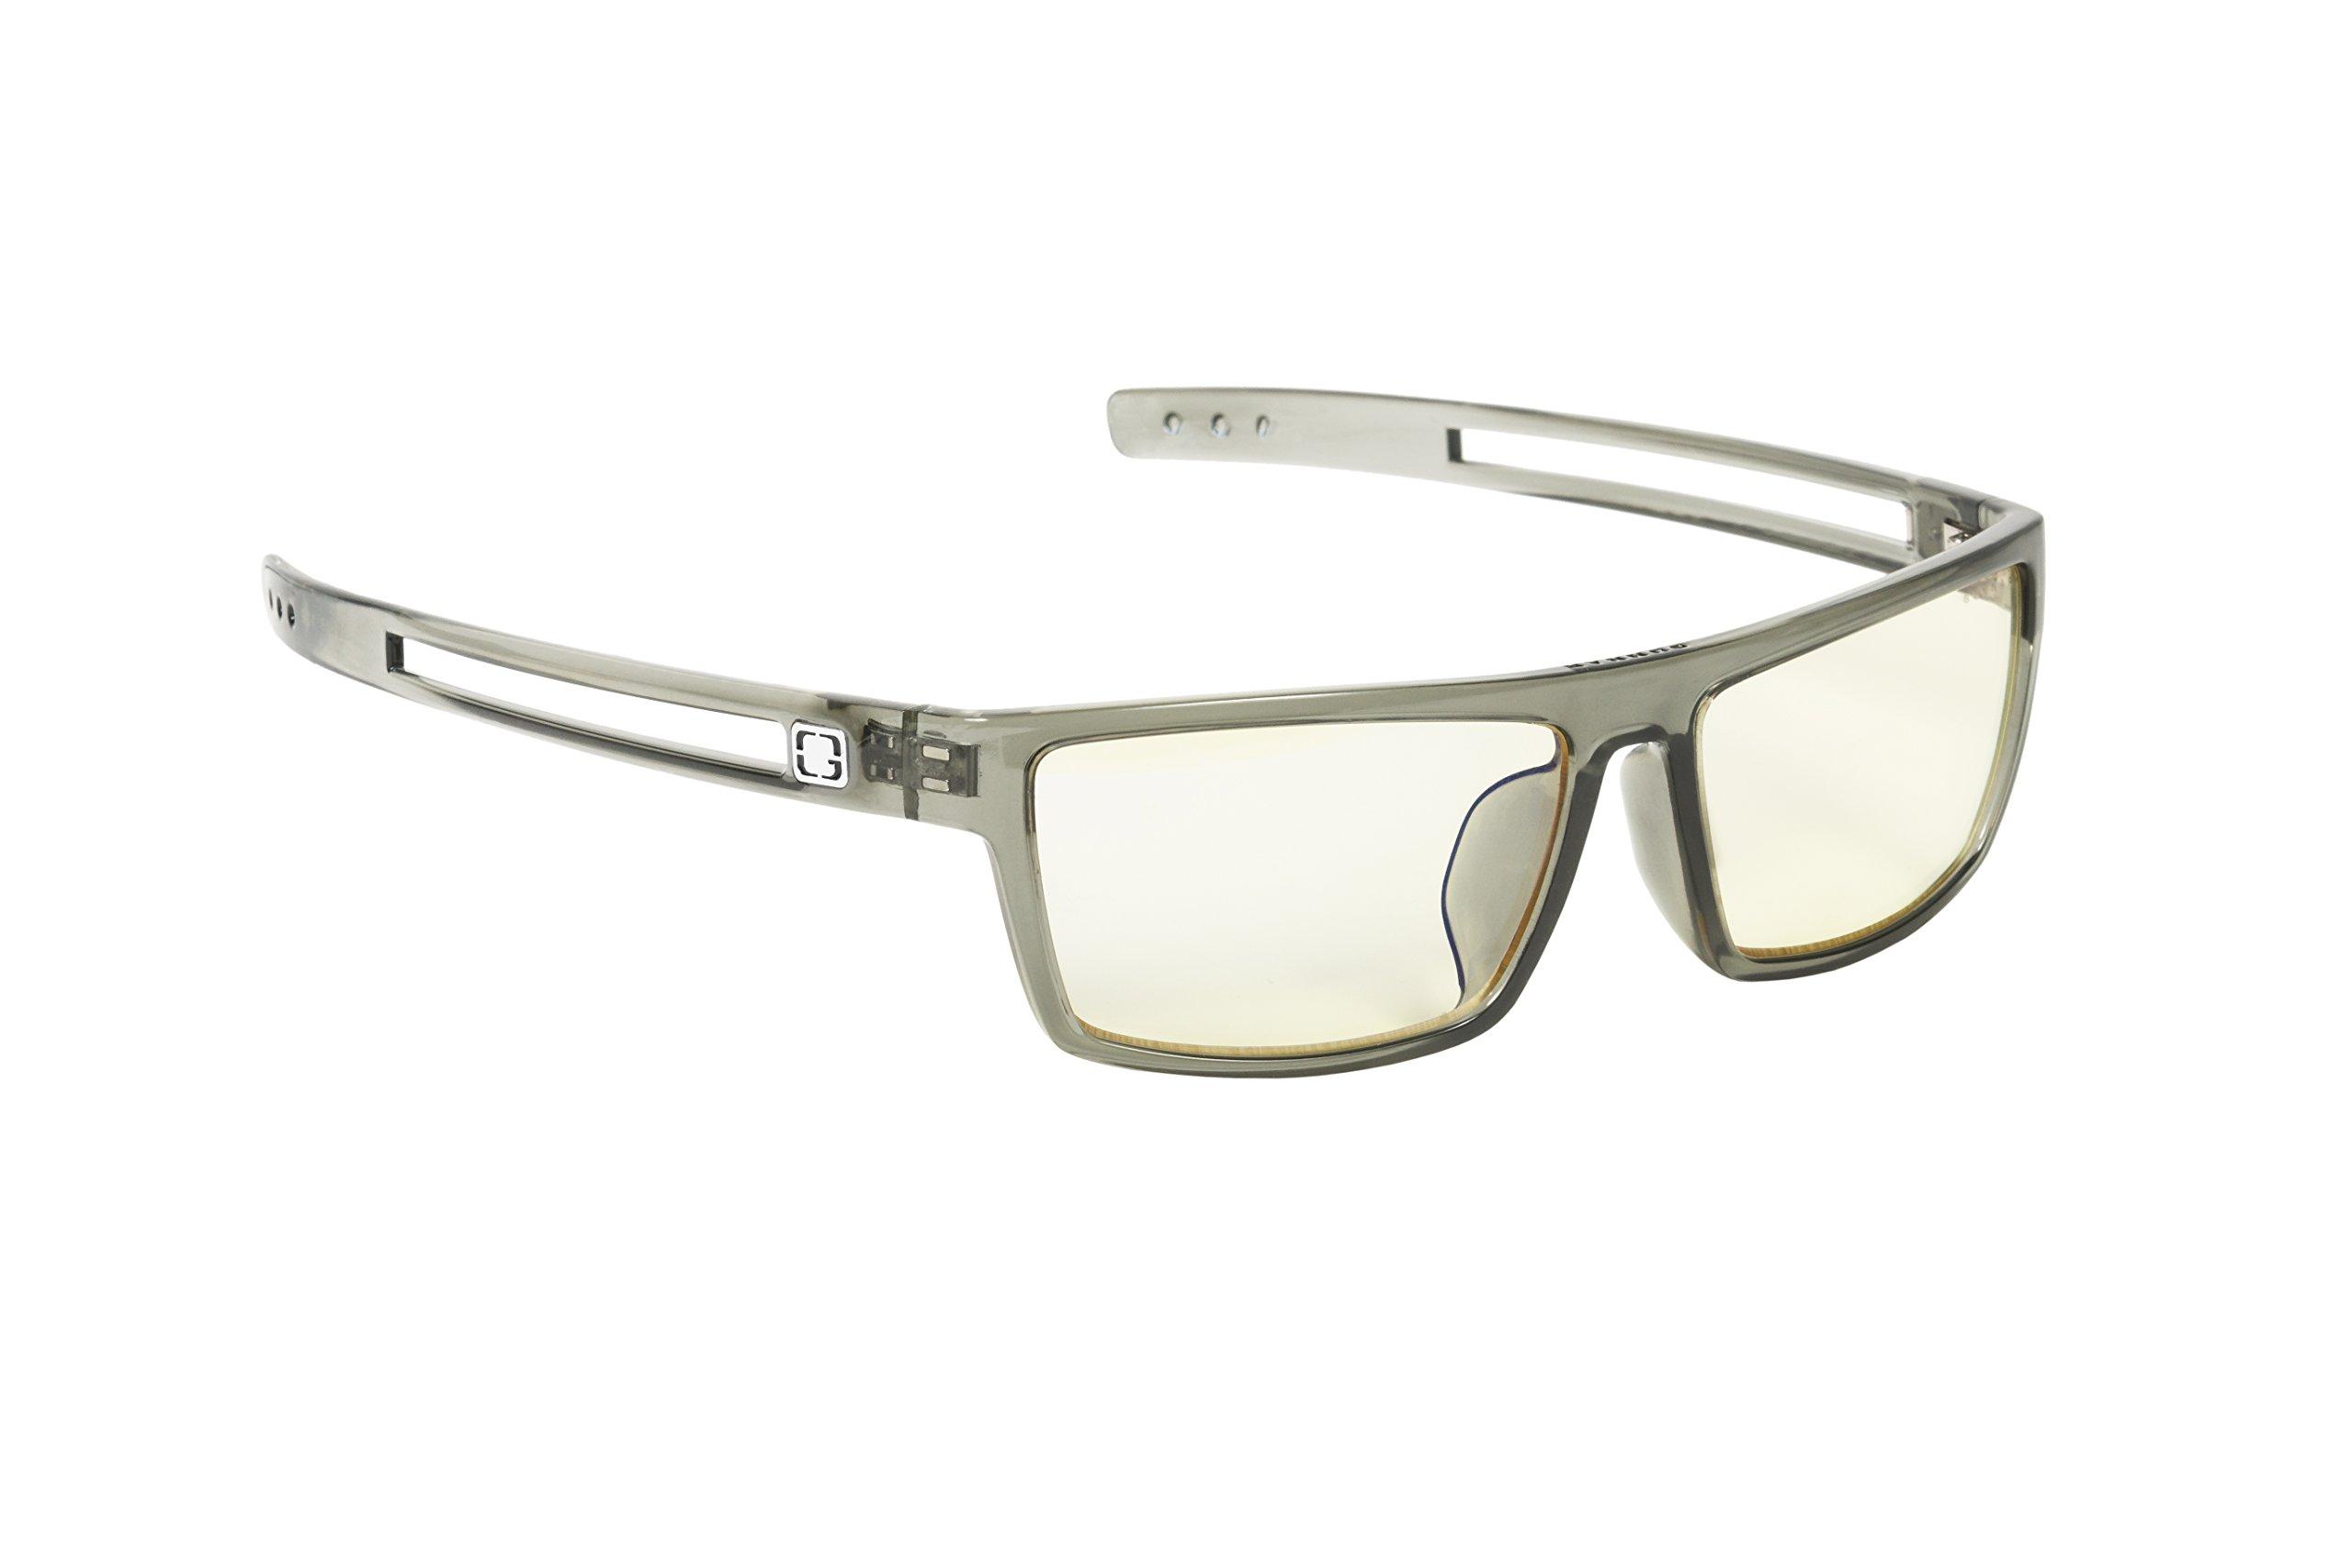 Gunnar Optiks Valve Computer Gaming Glasses - Block Blue Light, Anti-Glare and Minimize Digital Eye Strain - Prevent Headaches, Sleep Better, Reduce Eye Fatigue, Smoke - Not Machine Specific